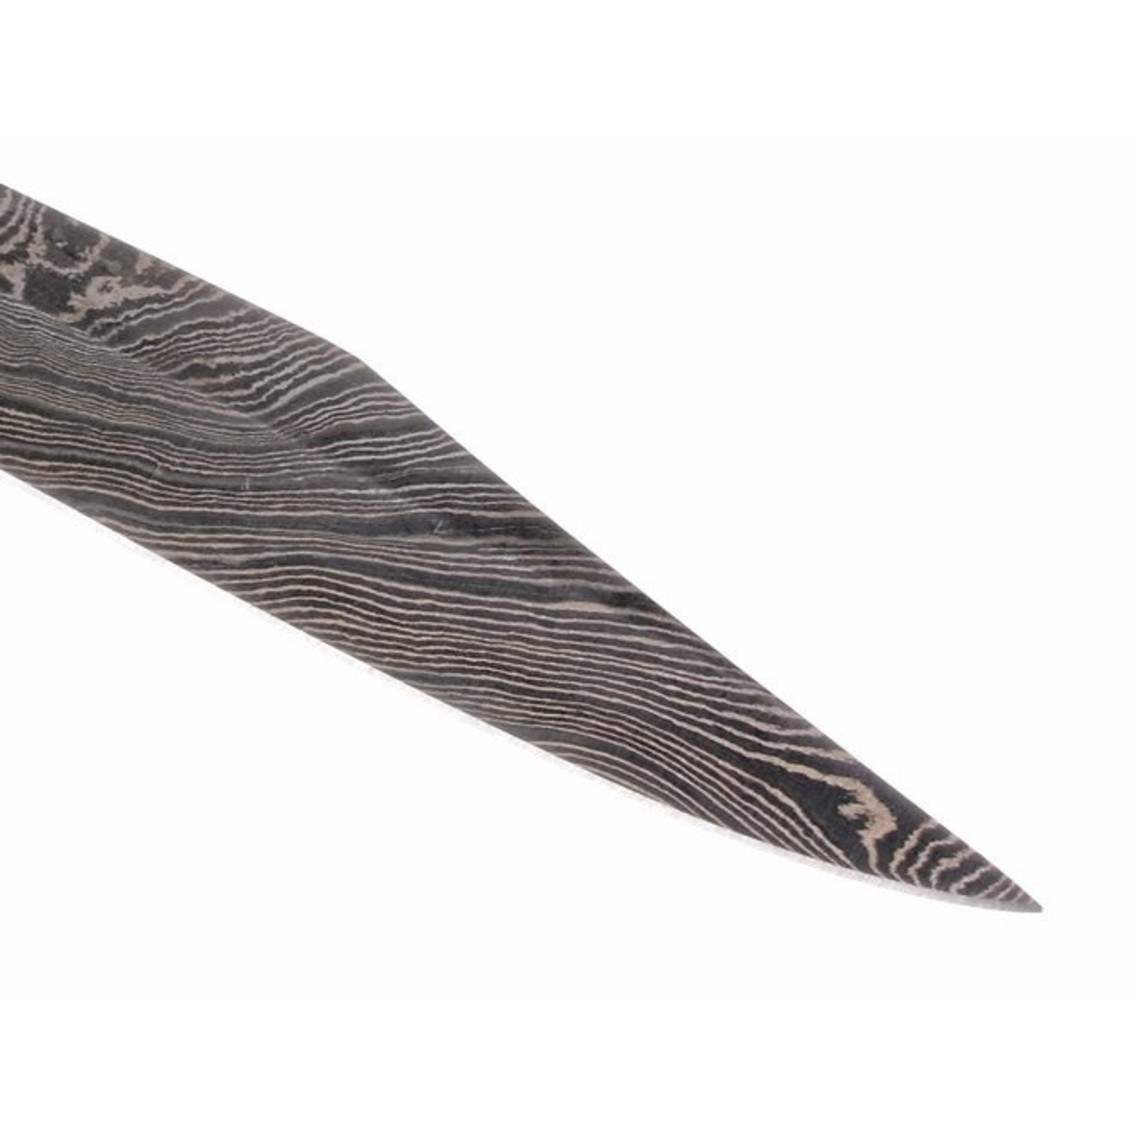 Cuchillo Haithabu Damasco, 14 cm.